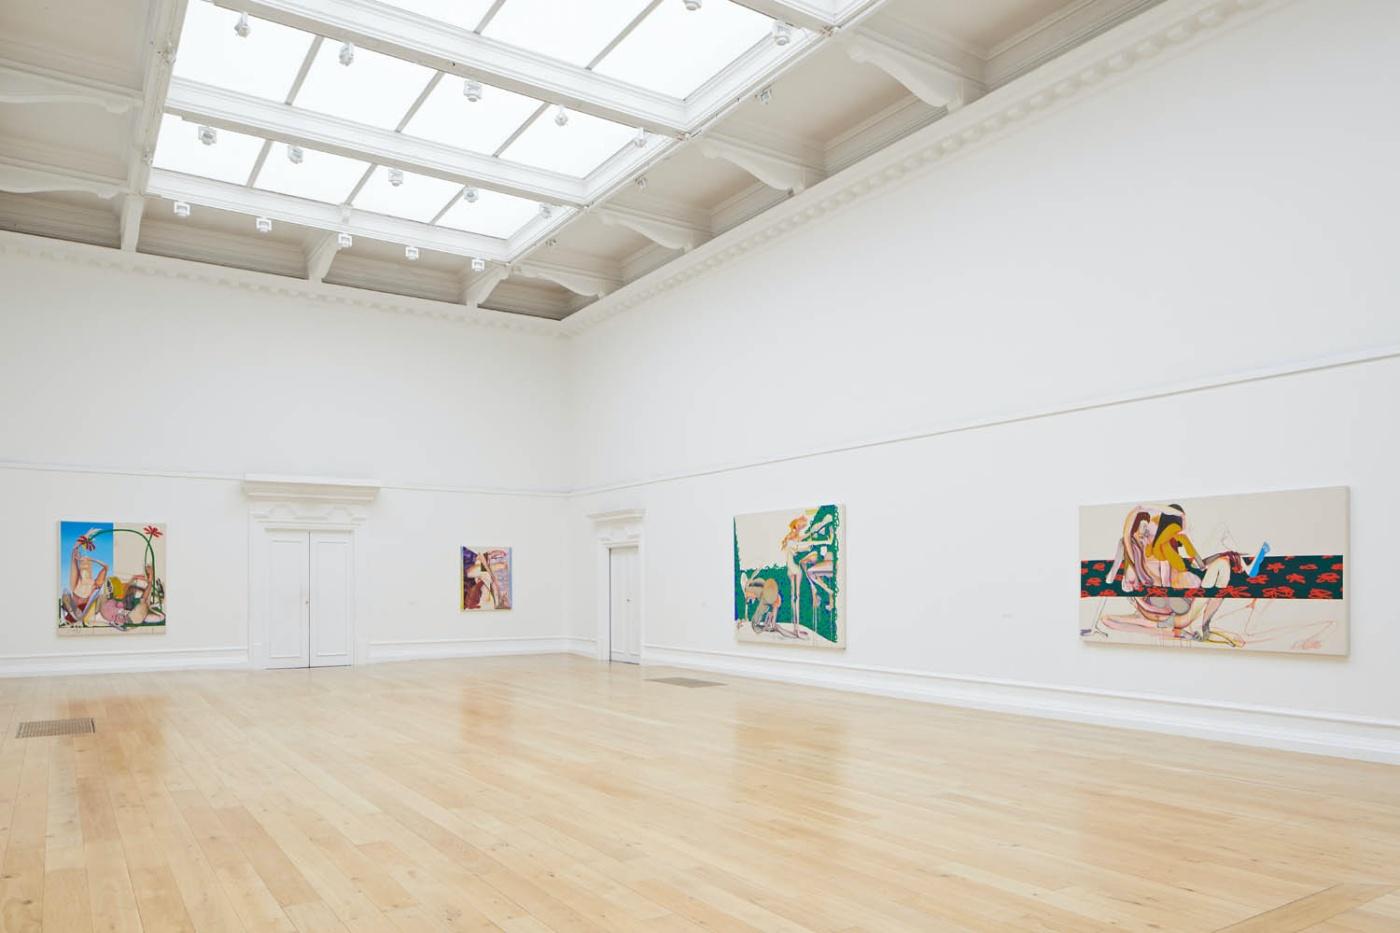 South London Gallery Christina Quarles 3